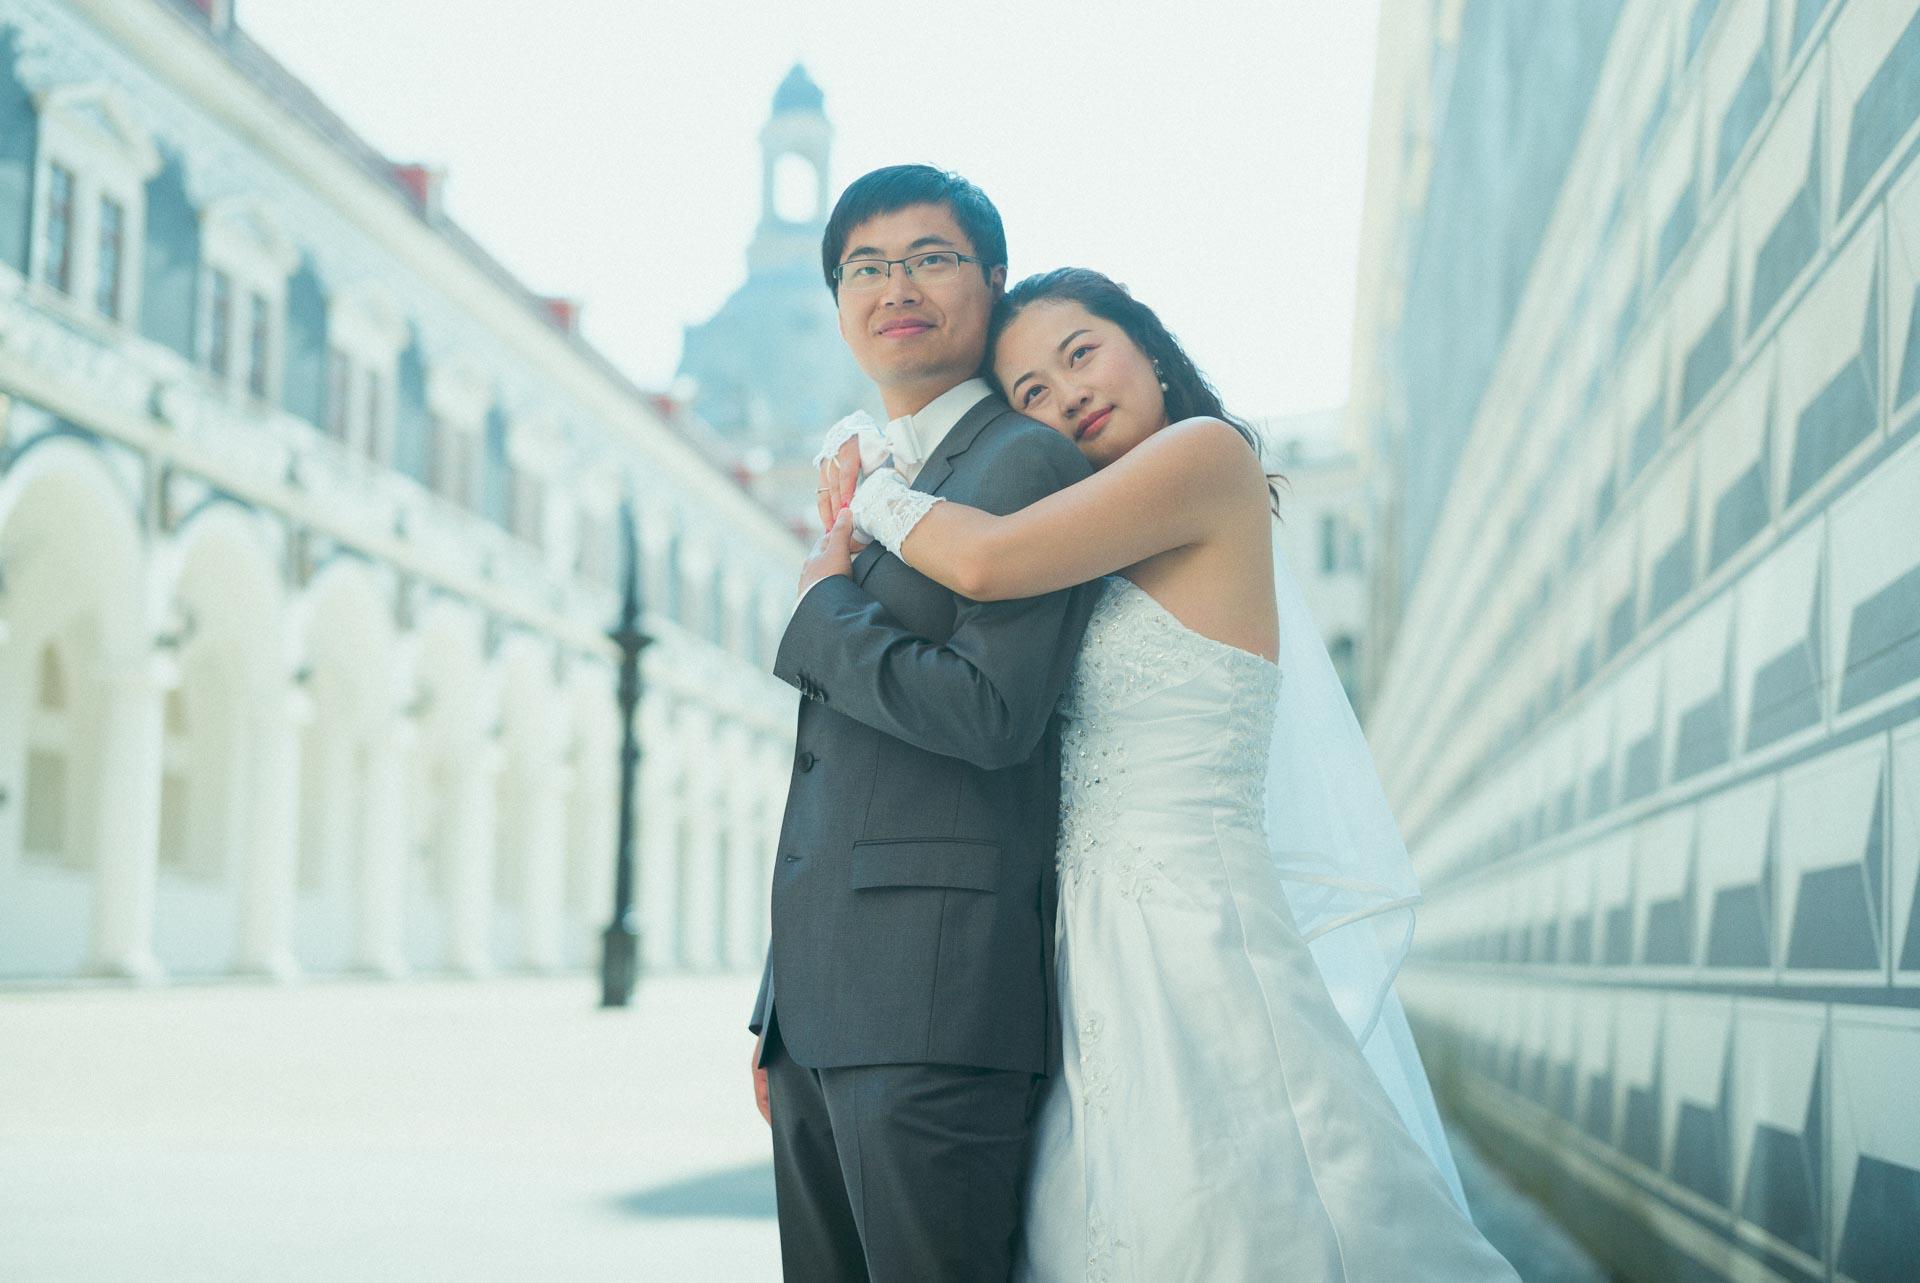 Hochzeitsfotograf Dresden - Hochzeitsfotografie Dresden Schloss